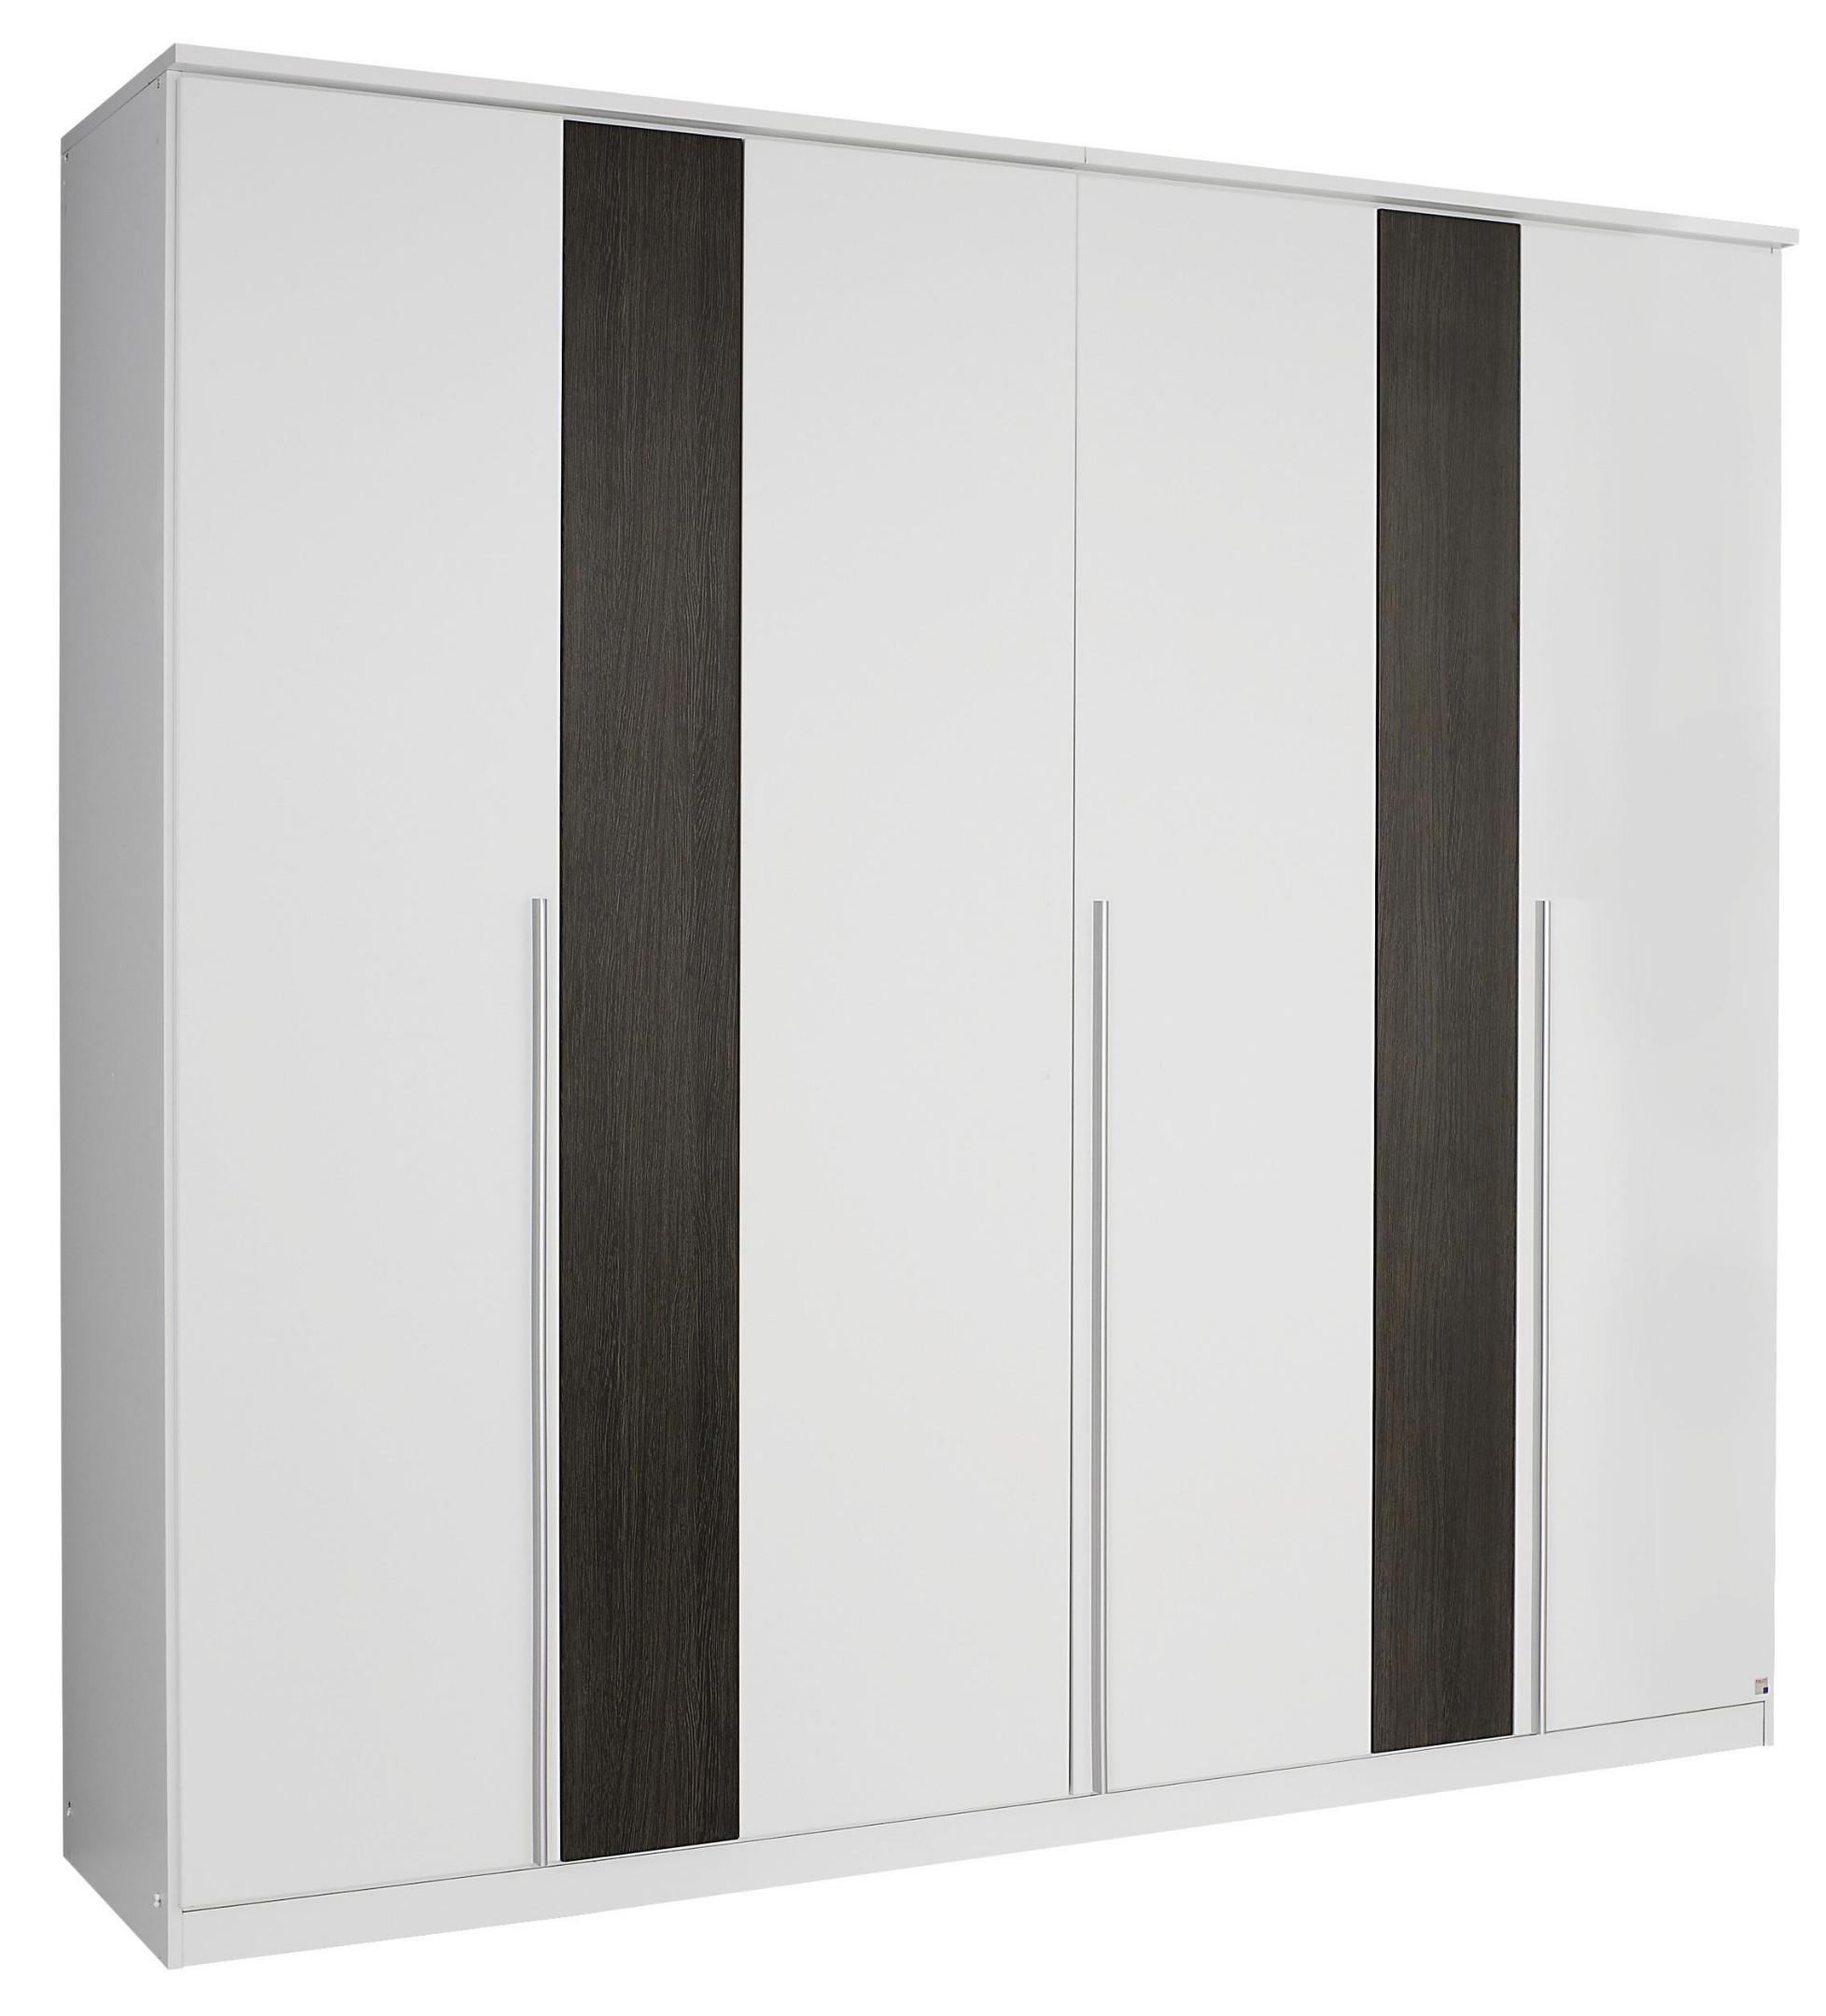 kleiderschrank alpinweiss wenge shiraz woody 33 00914 holz modern m bel24. Black Bedroom Furniture Sets. Home Design Ideas